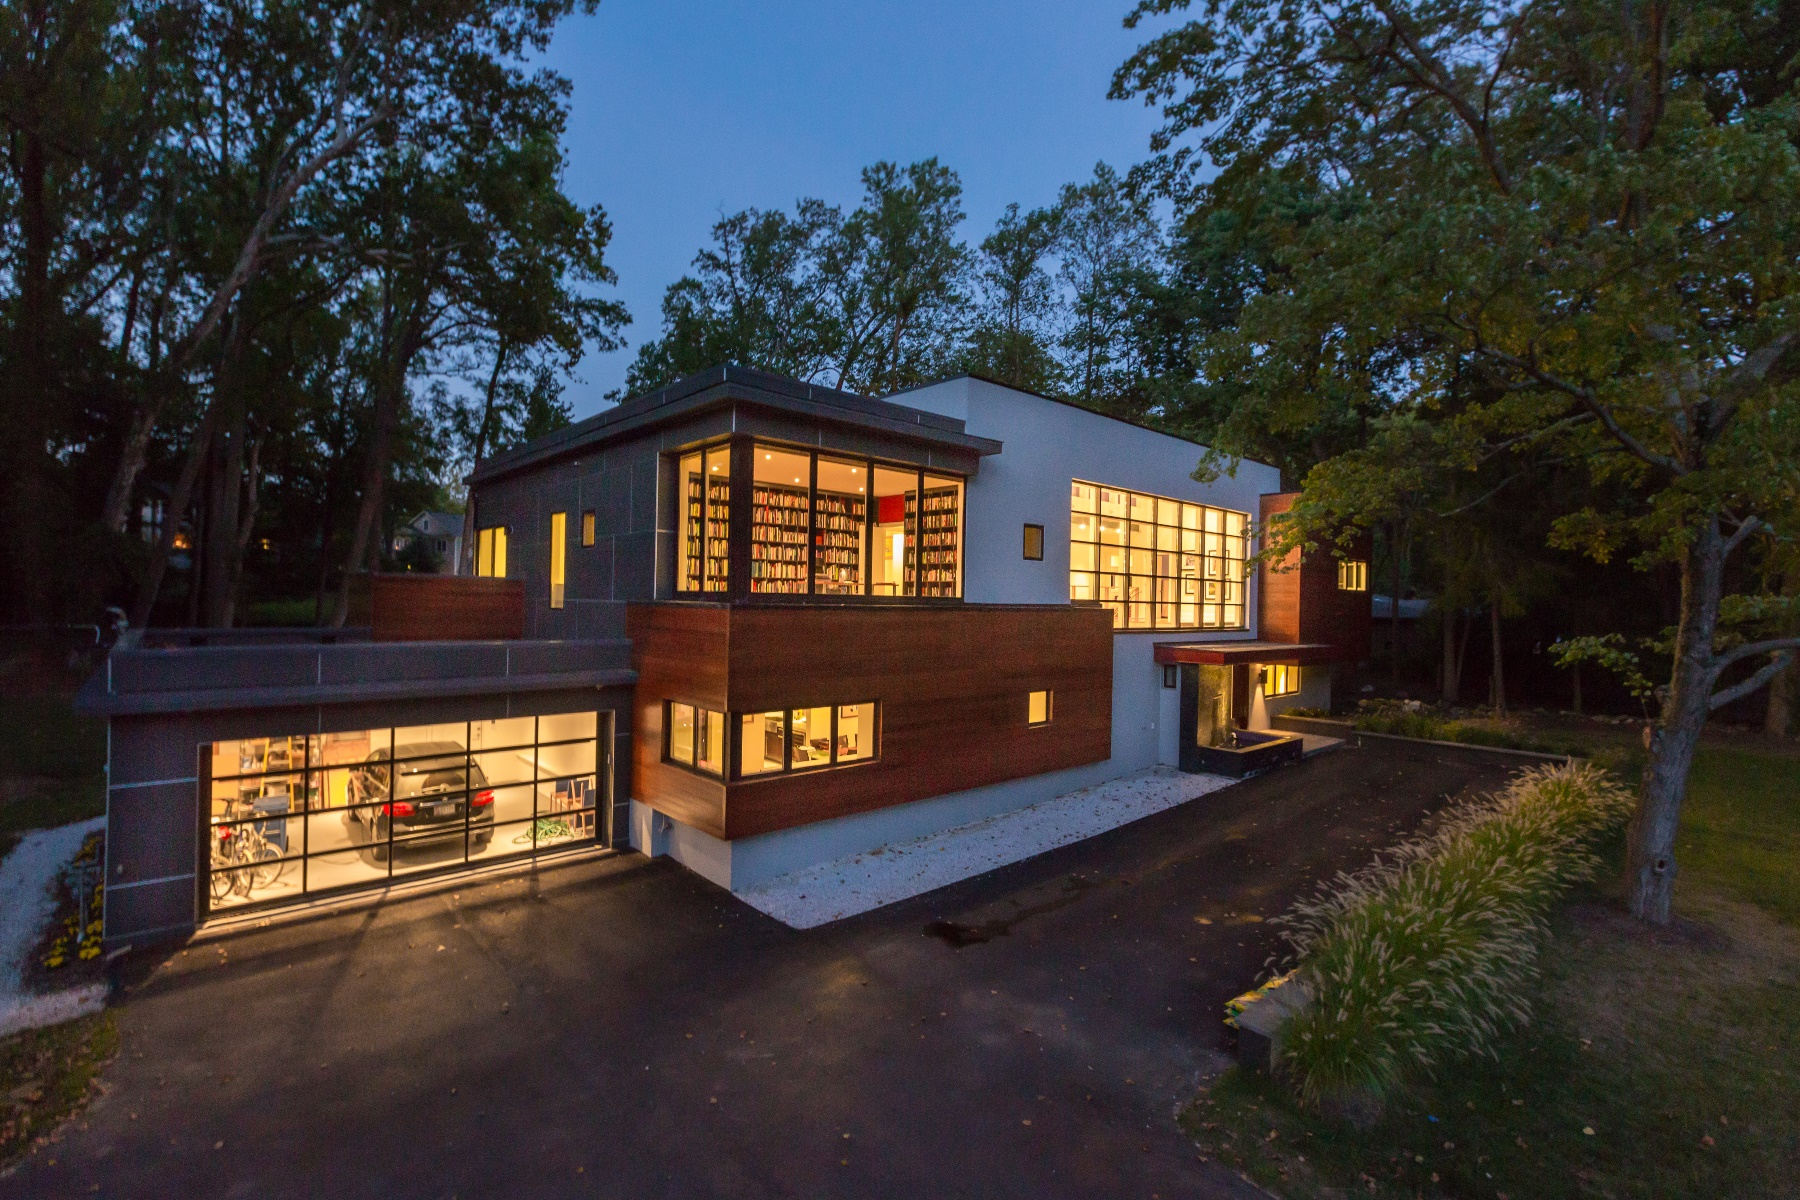 Villa per Vendita alle ore 6309 Bradley Boulevard, Bethesda 6309 Bradley Blvd Bethesda, Maryland 20817 Stati Uniti